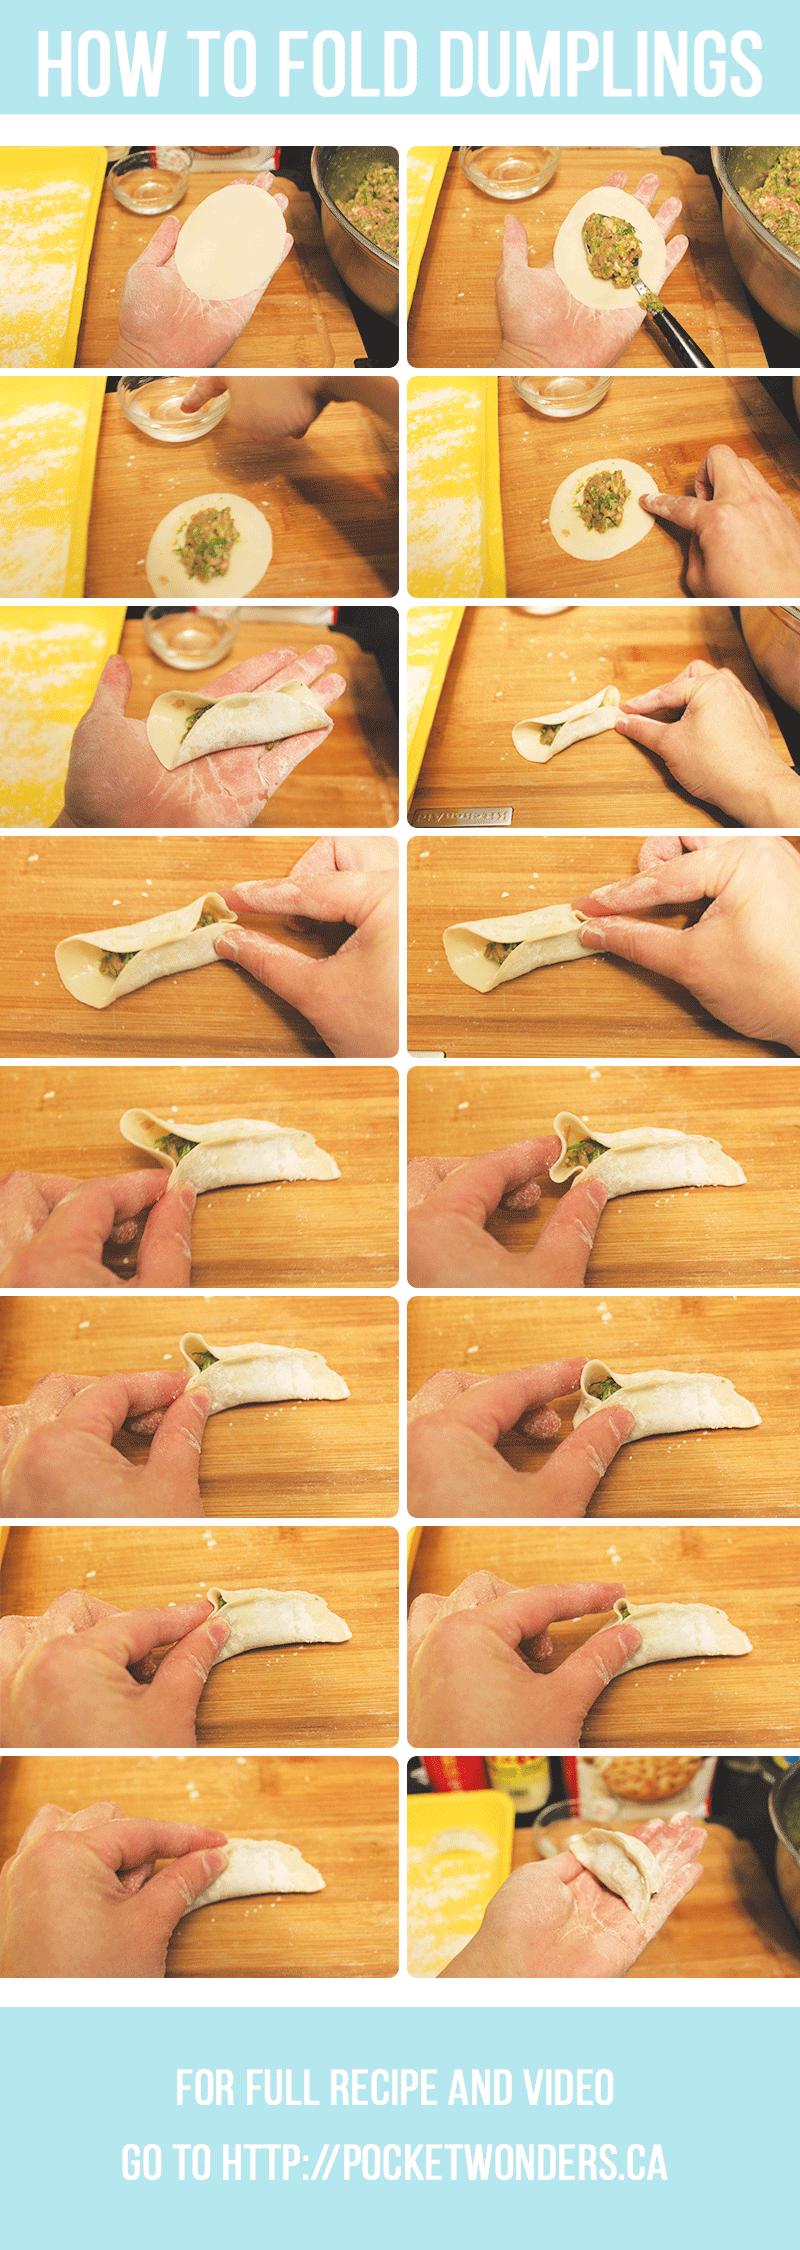 how to make dumplings - how to fold dumplings